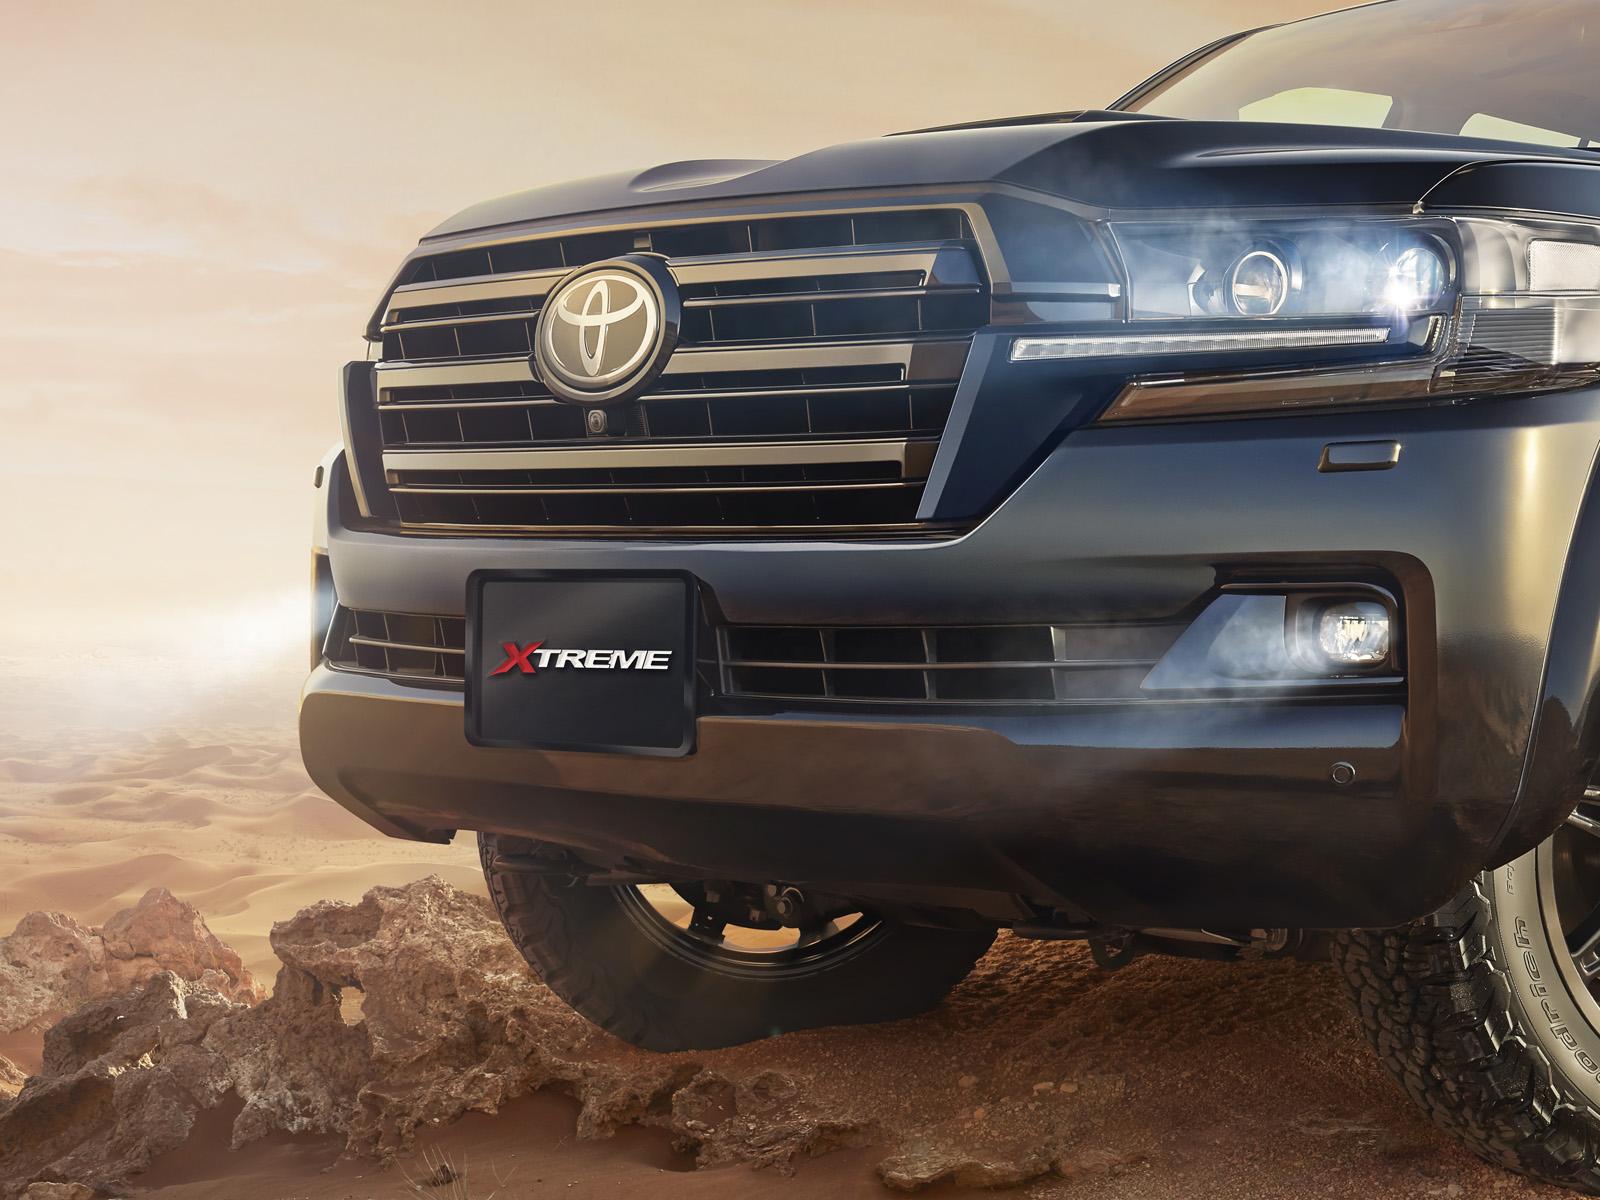 Toyota Xtreme Range detail 4